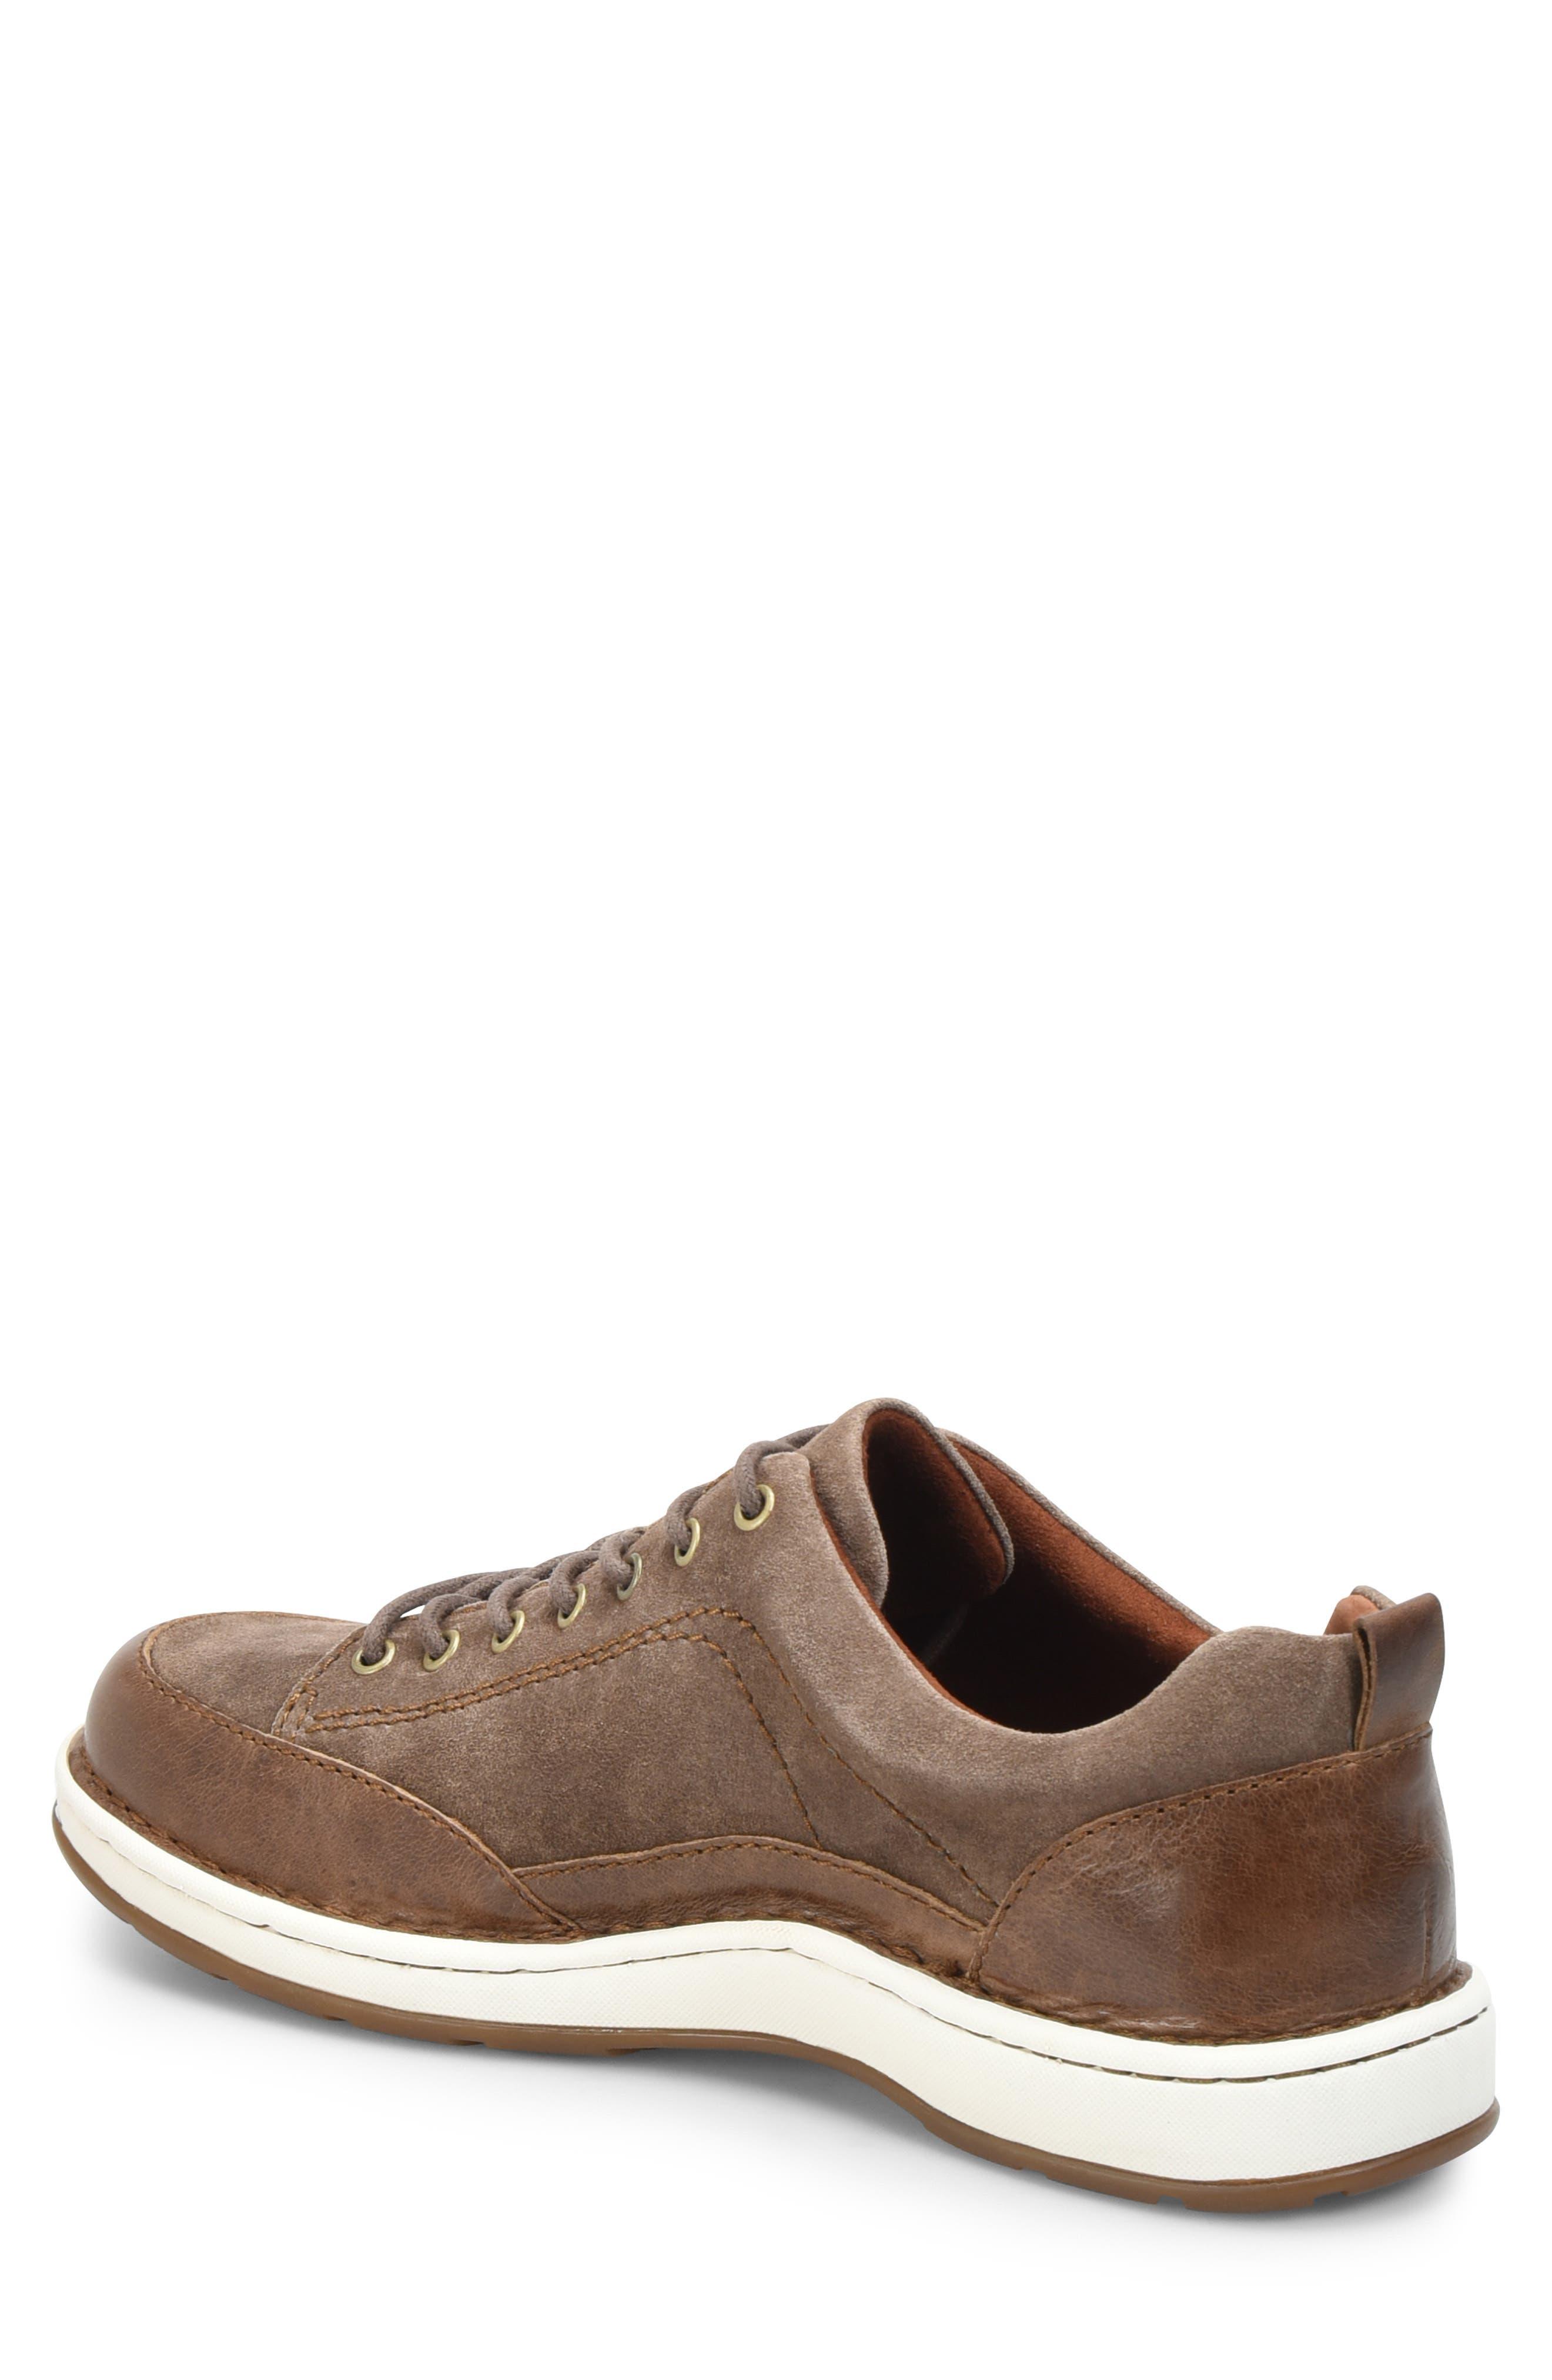 Kruger Moc Toe Sneaker,                             Alternate thumbnail 2, color,                             TAUPE LEATHER